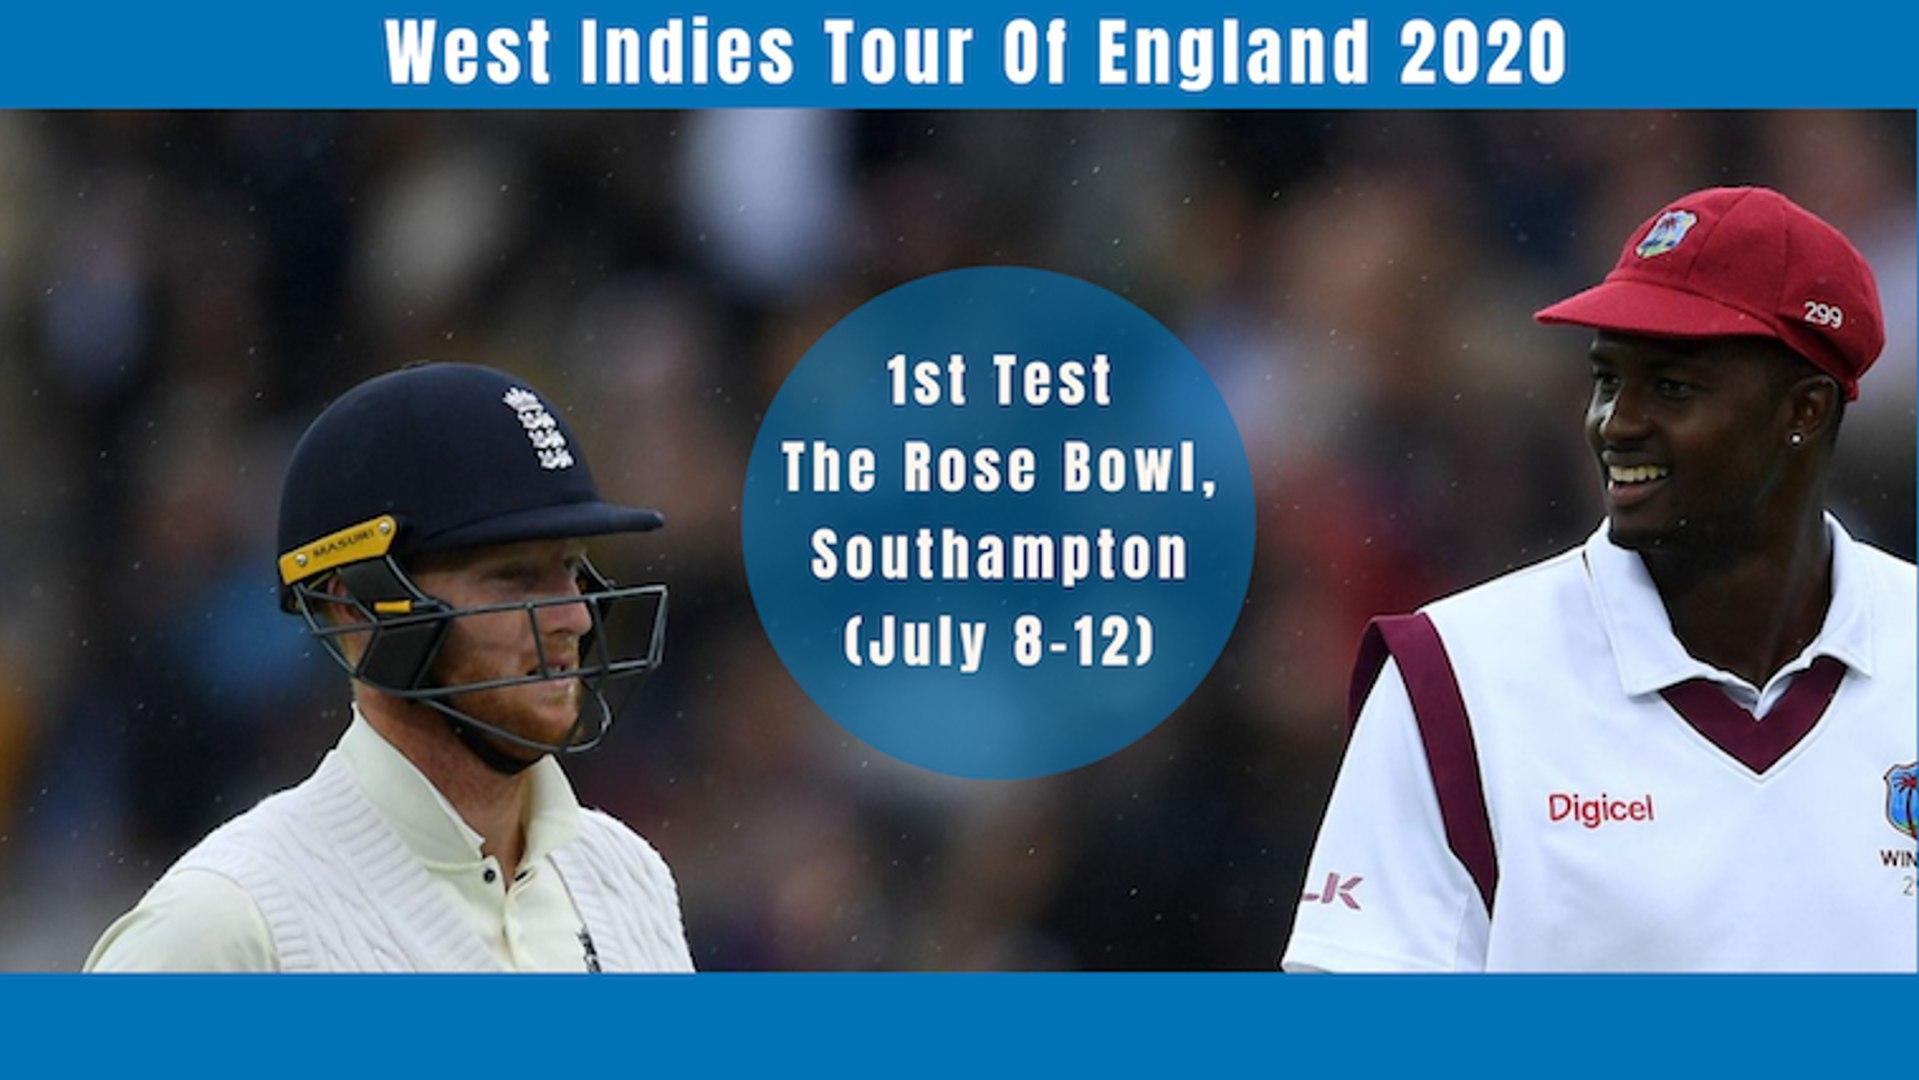 वेस्ट इंडीज़ बनाम इंग्लैंड, पहला टेस्ट मैच (प्रीव्यू)